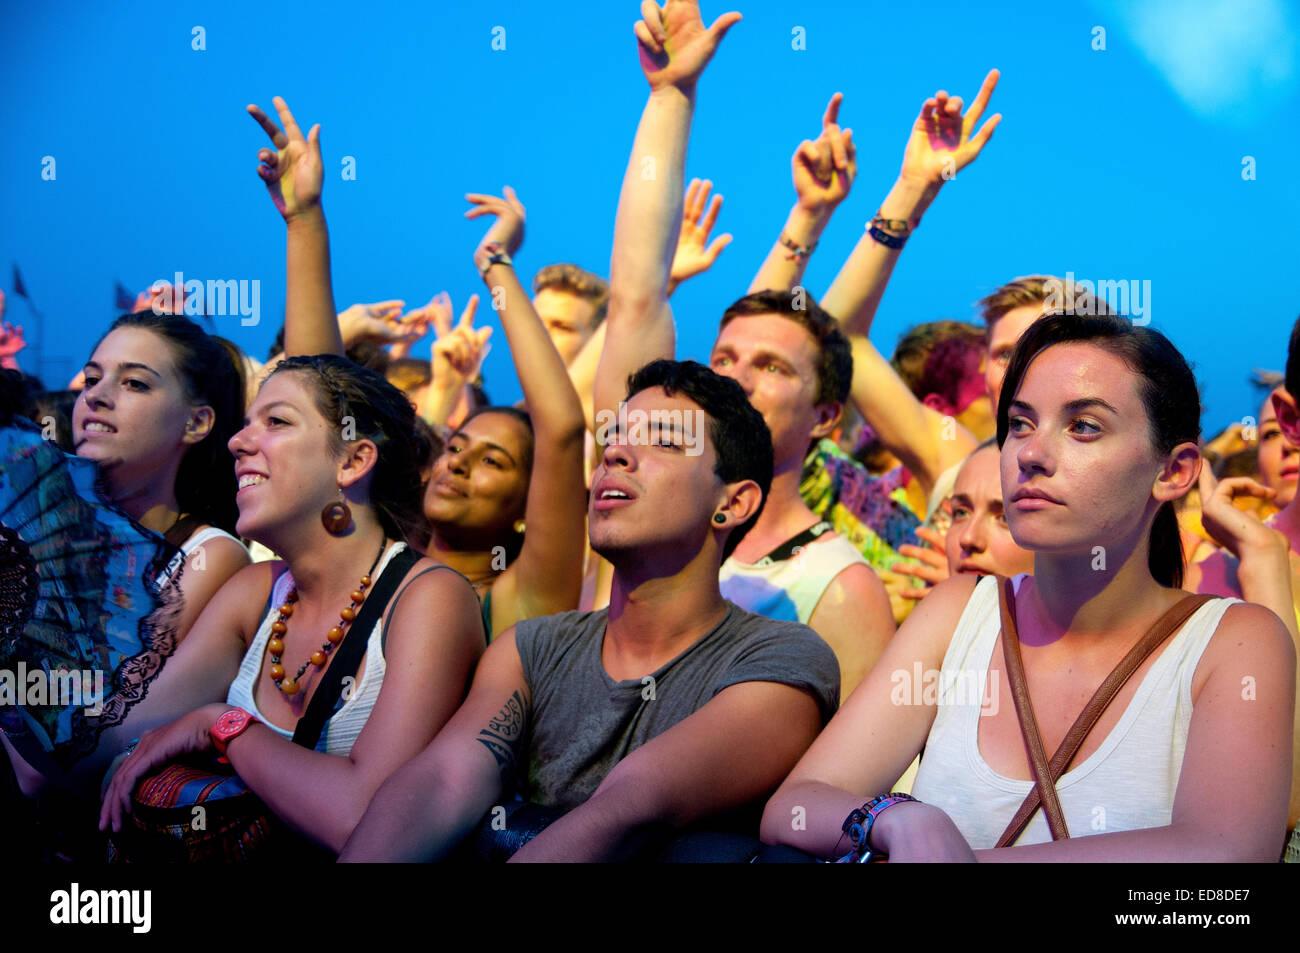 BENICASSIM, SPAIN - JULY 19: Crowd (fans) at FIB (Festival Internacional de Benicassim) 2013 Festival. - Stock Image